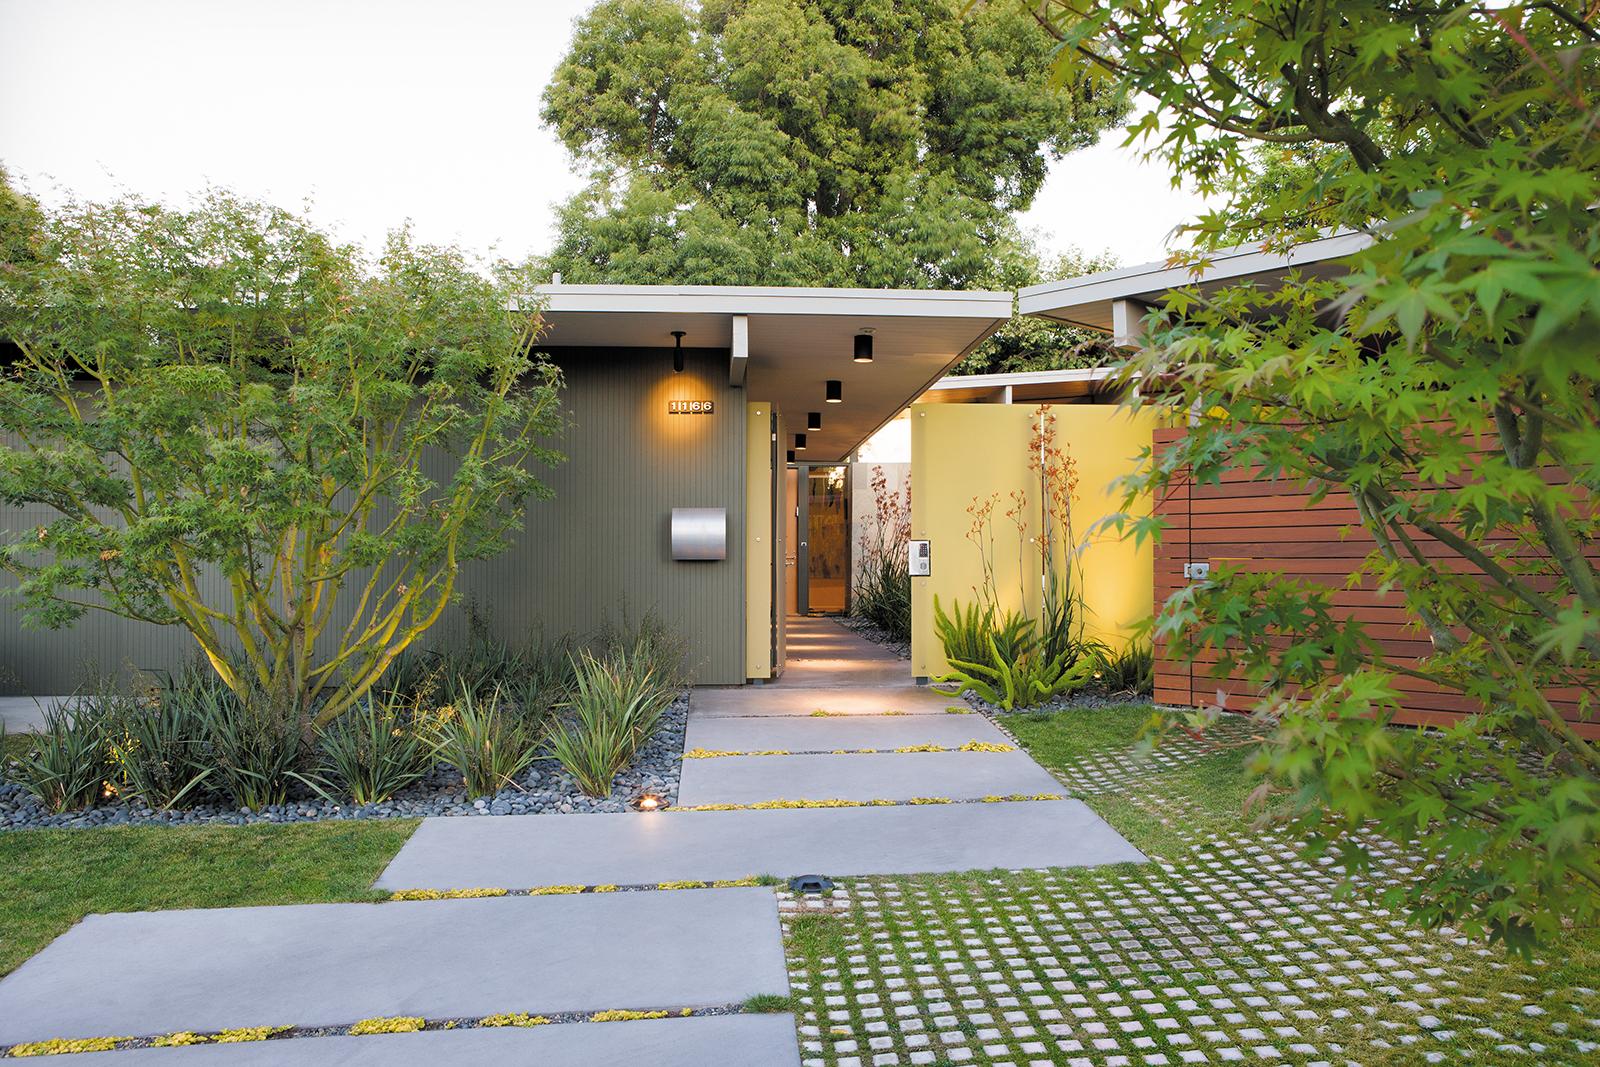 modern entrance ipe fence wood plants concrete pavers